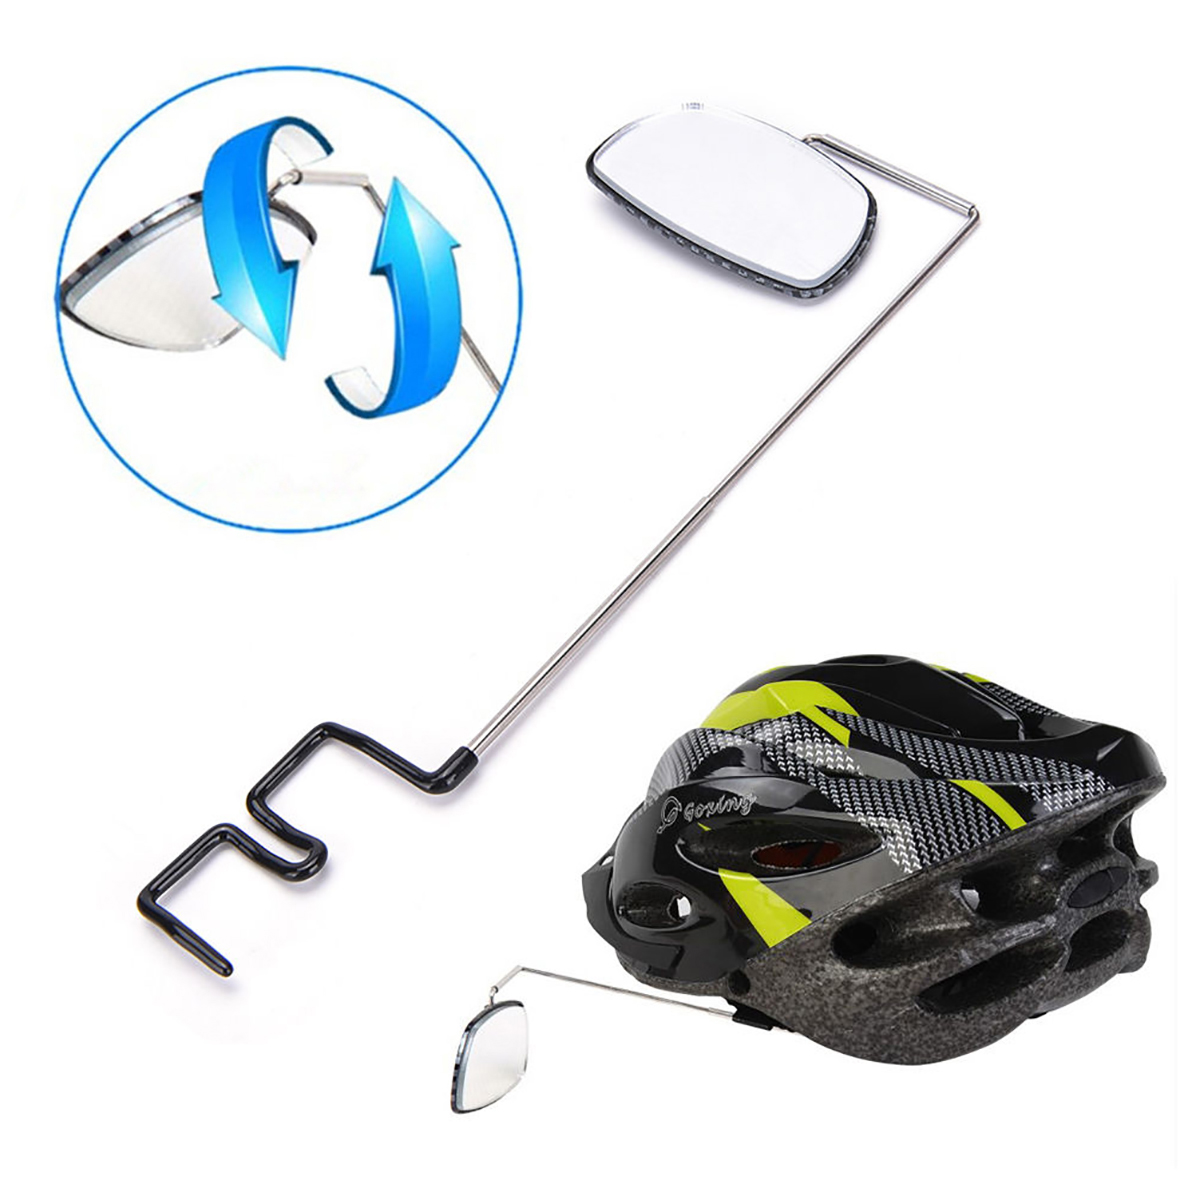 Bicycle Rearview Cycling Riding Helmet Eyeglass Mirror Rearview Adjustable Black Bicycle Rearview Bike Accessories